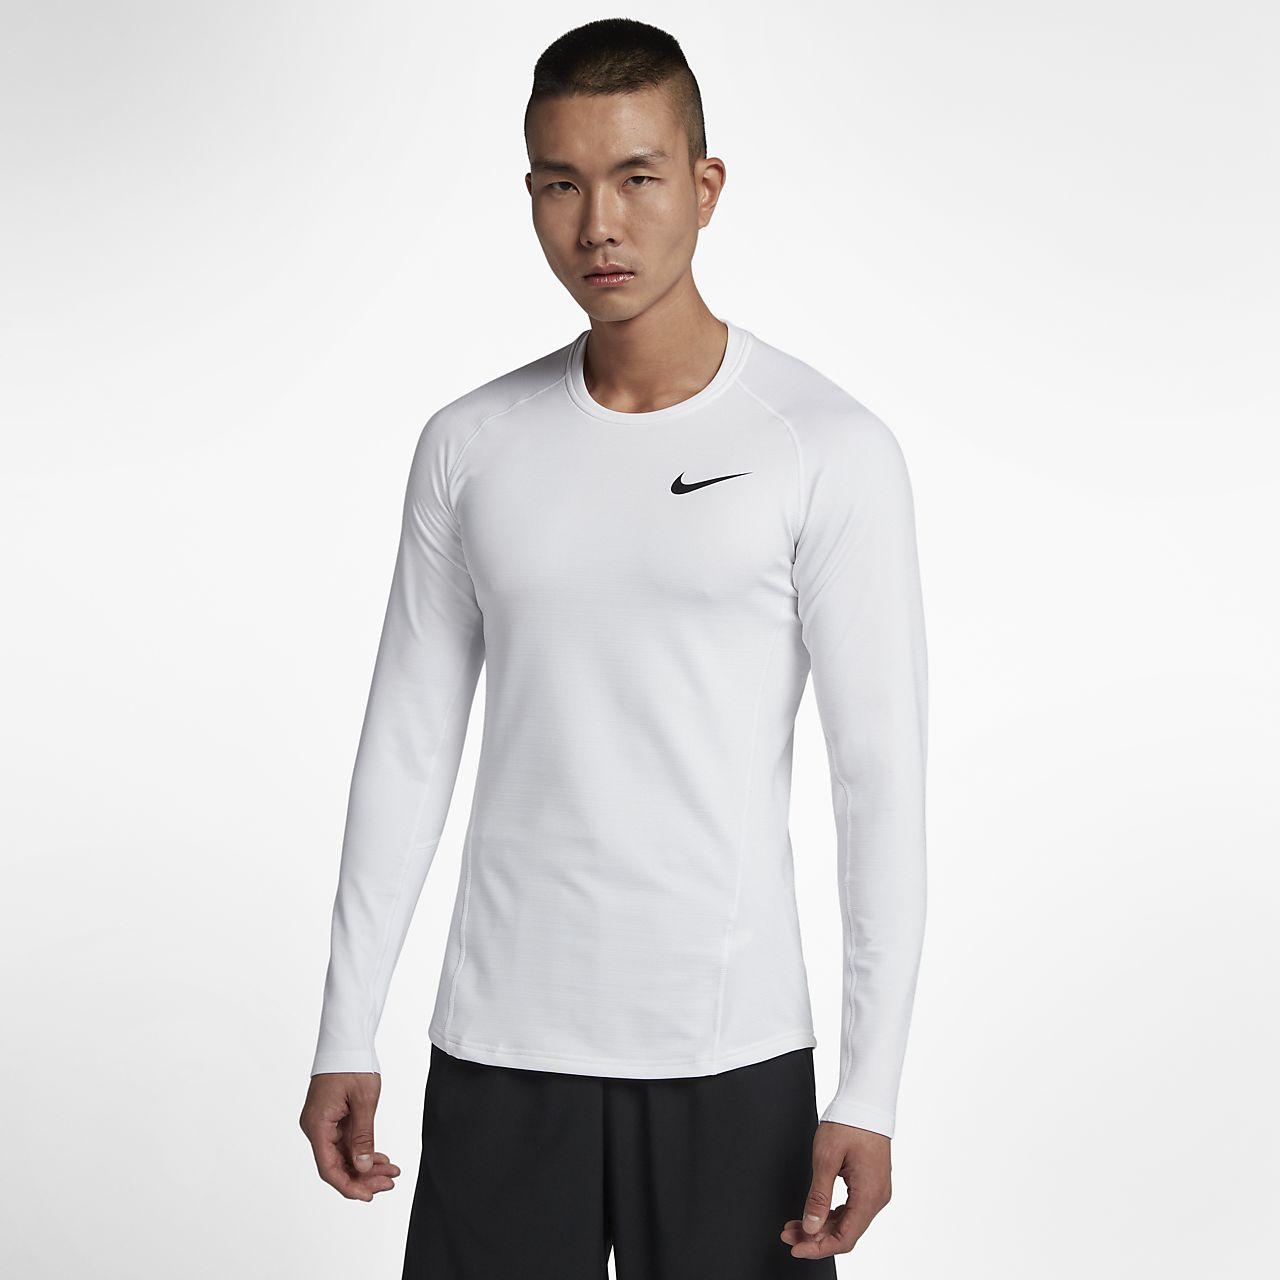 e1efde02e3d Nike Pro Warm Men s Long Sleeve Training Top. Nike.com